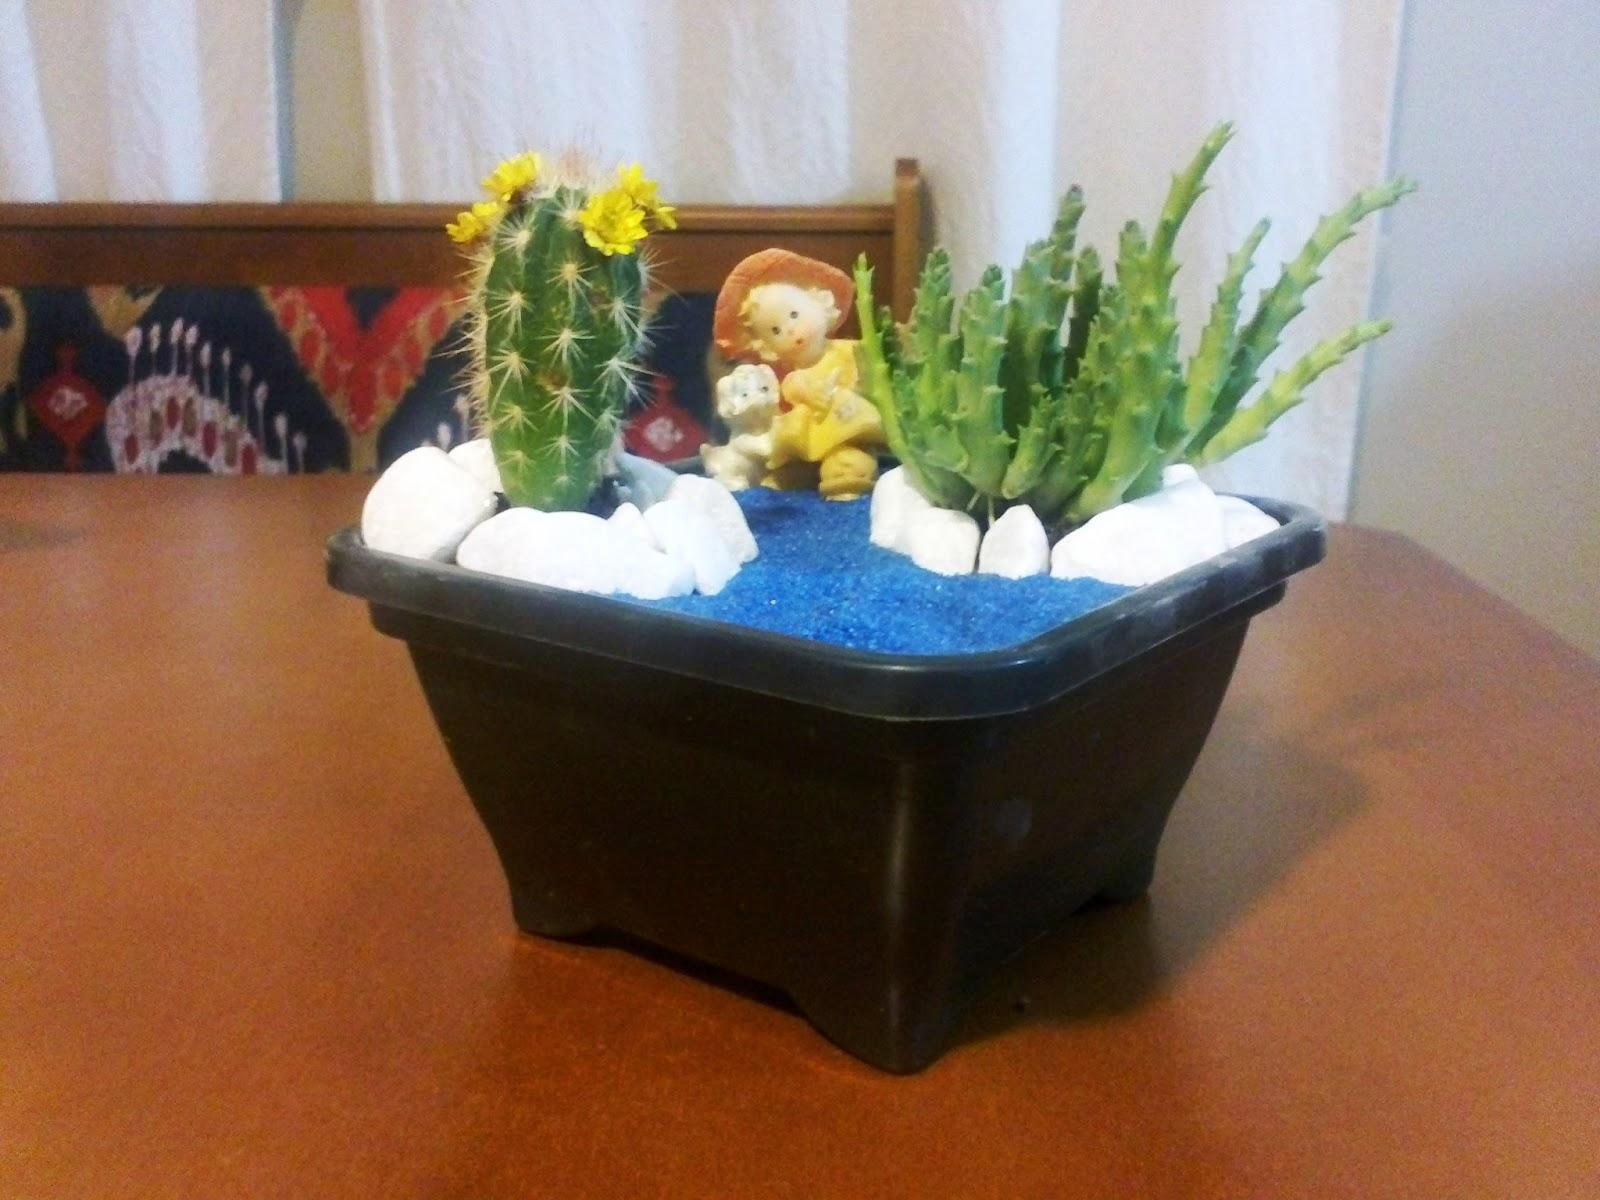 mini jardim cactos suculentas : mini jardim cactos suculentas:Inovando com Cactos e Suculentas.: Mini Jardim de Cactos.